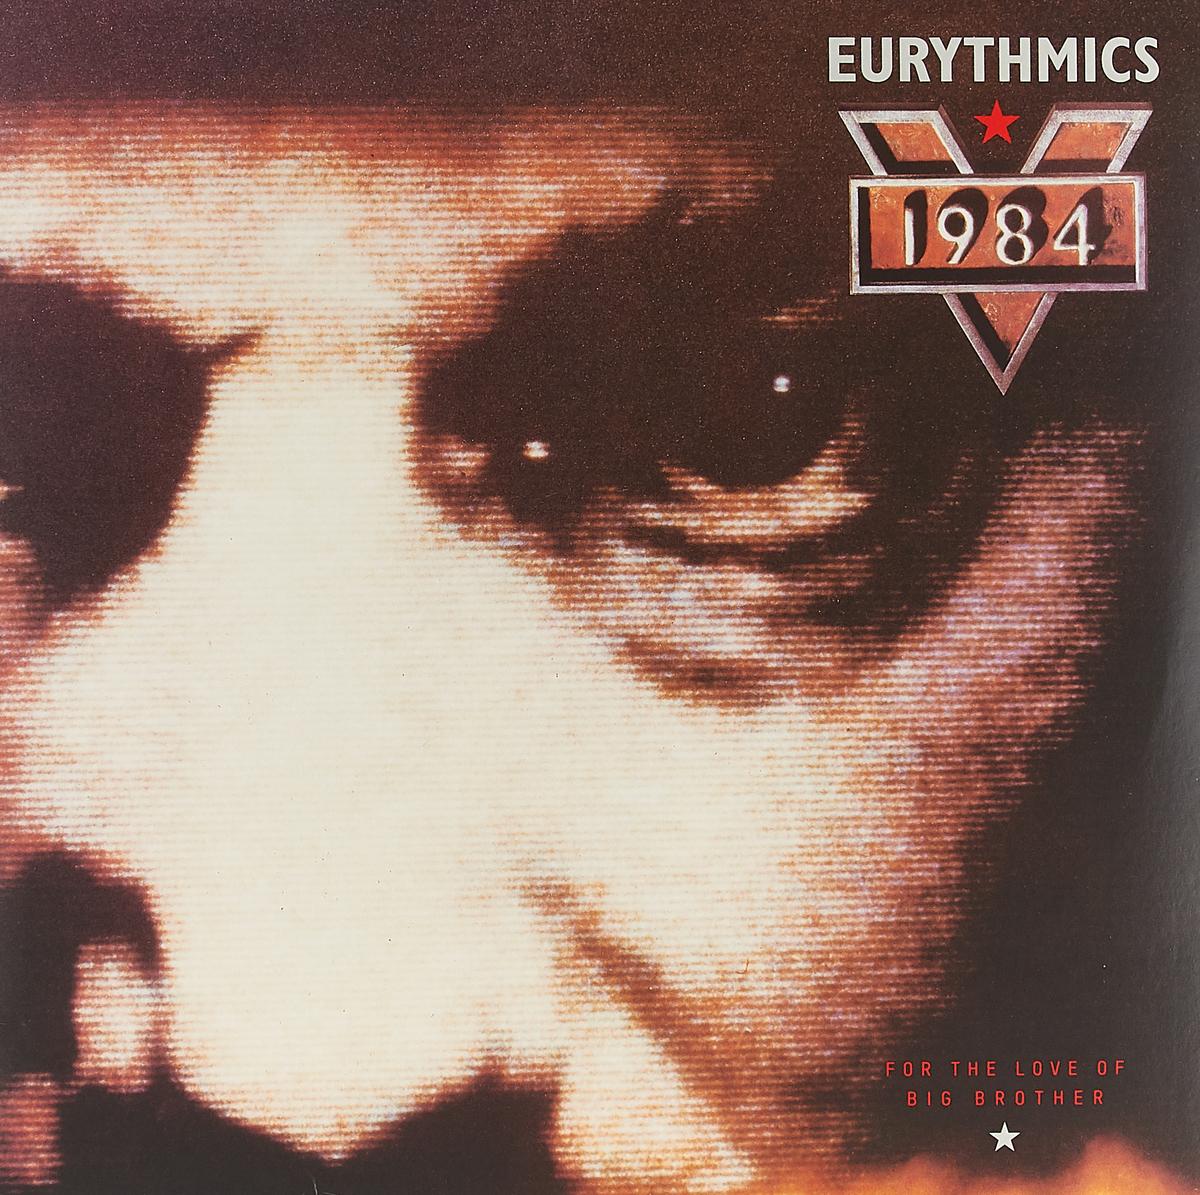 Eurythmics Eurythmics. 1984 (LP) eurythmics eurythmics greatest hits 2 lp